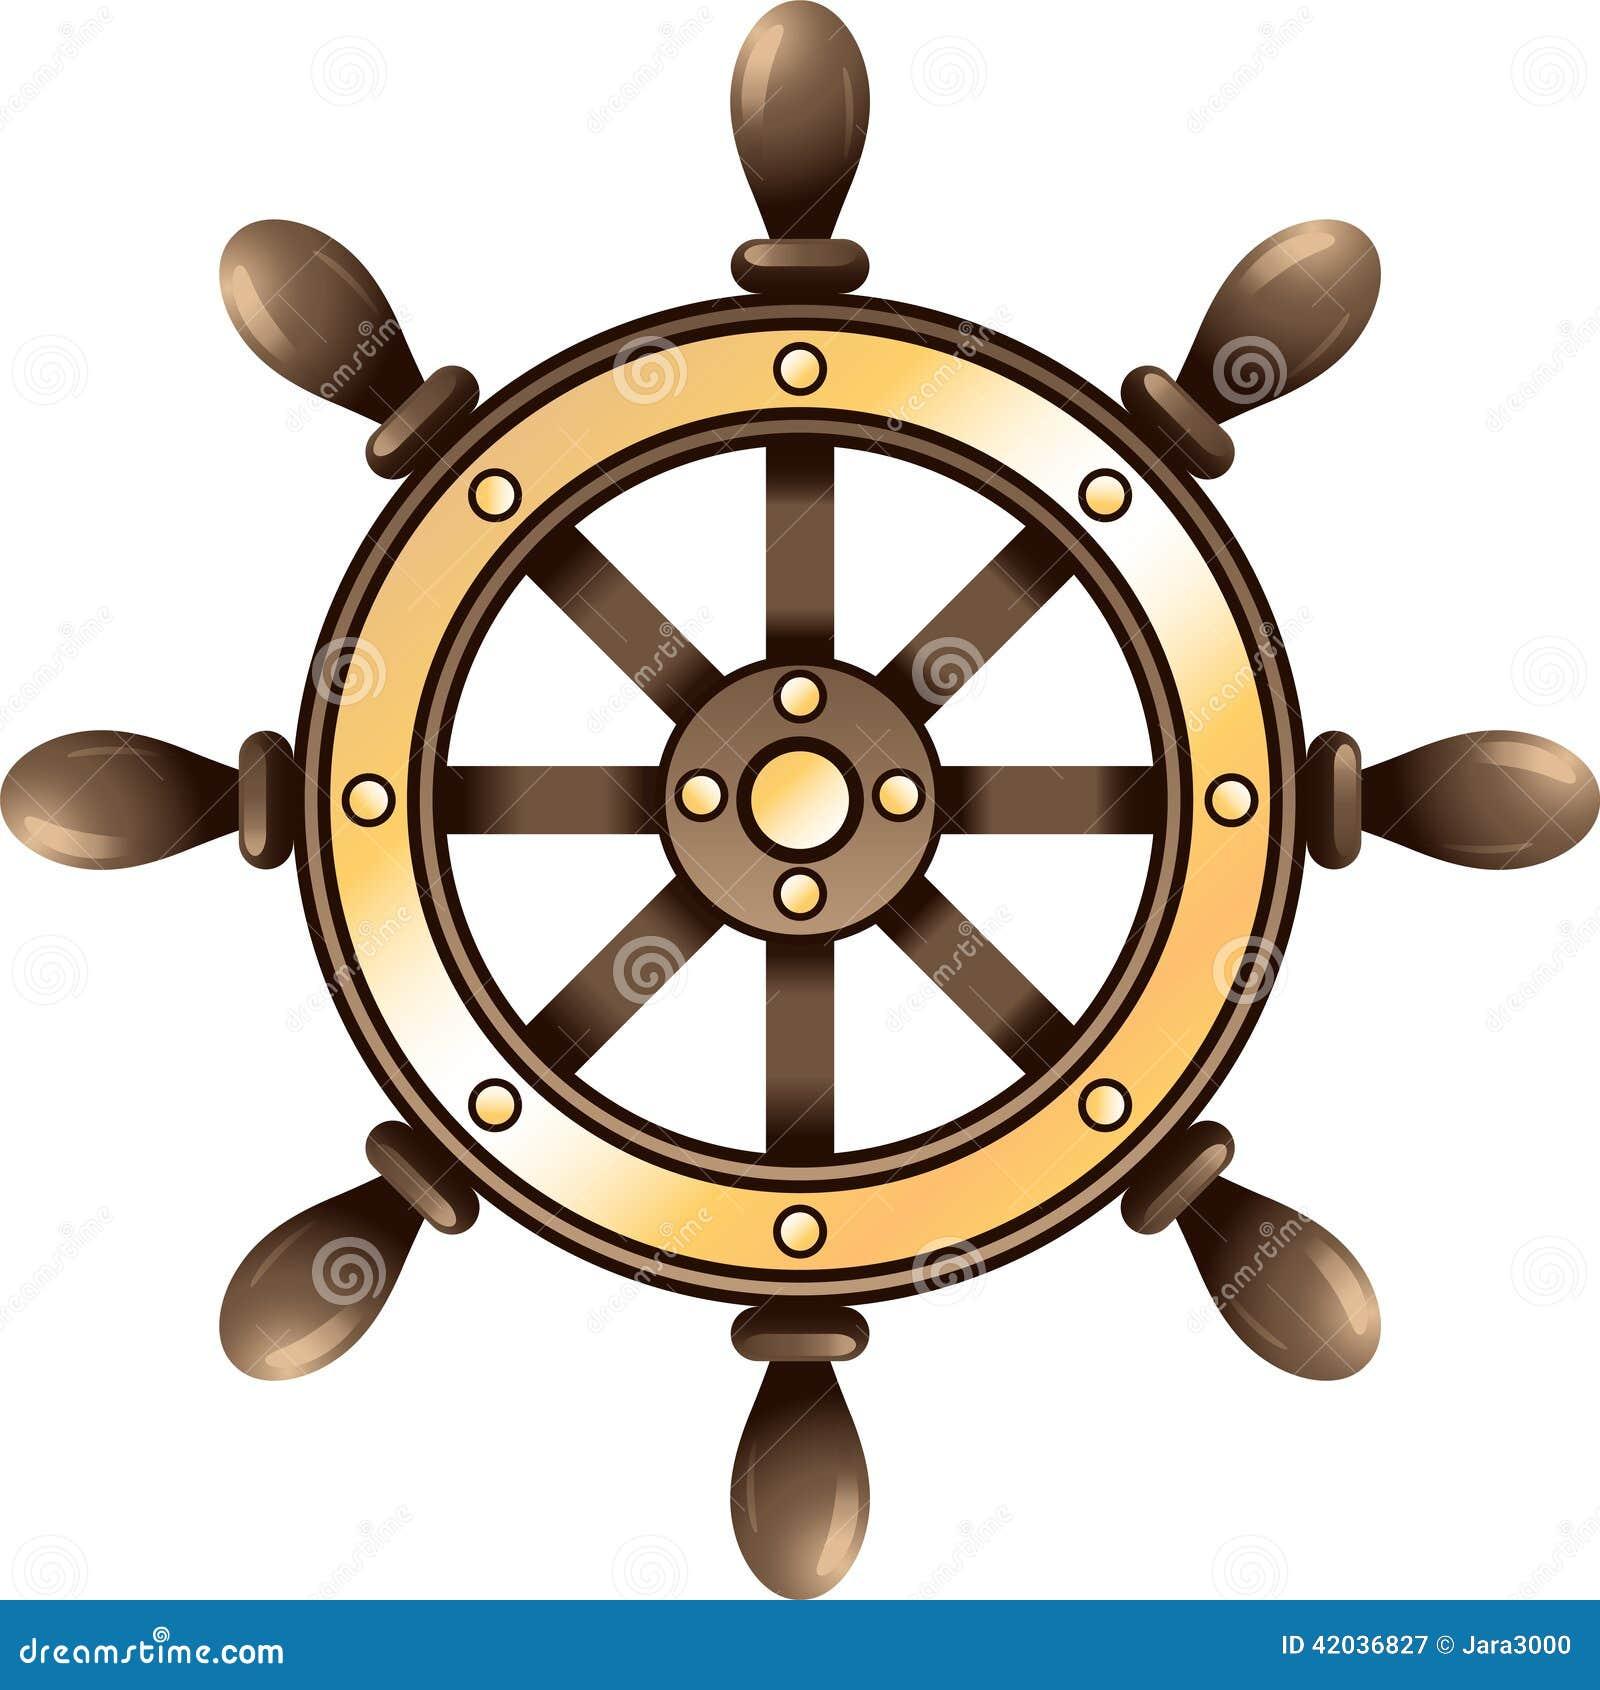 d898474c7 Ship steering wheel stock vector. Illustration of ship - 42036827